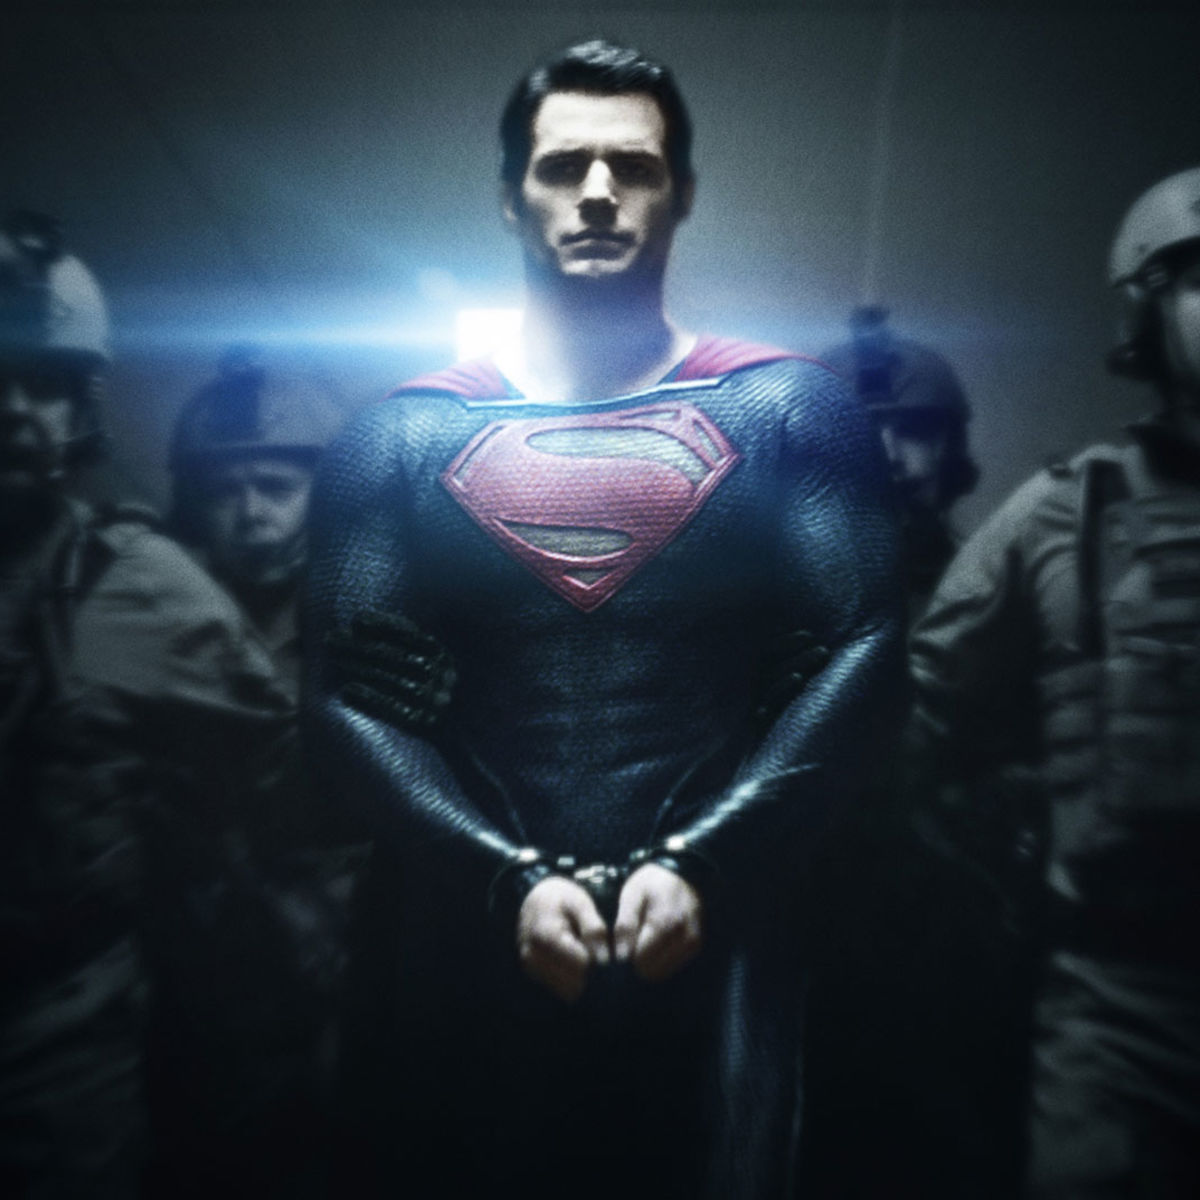 supermanmanofsteelbg.jpg